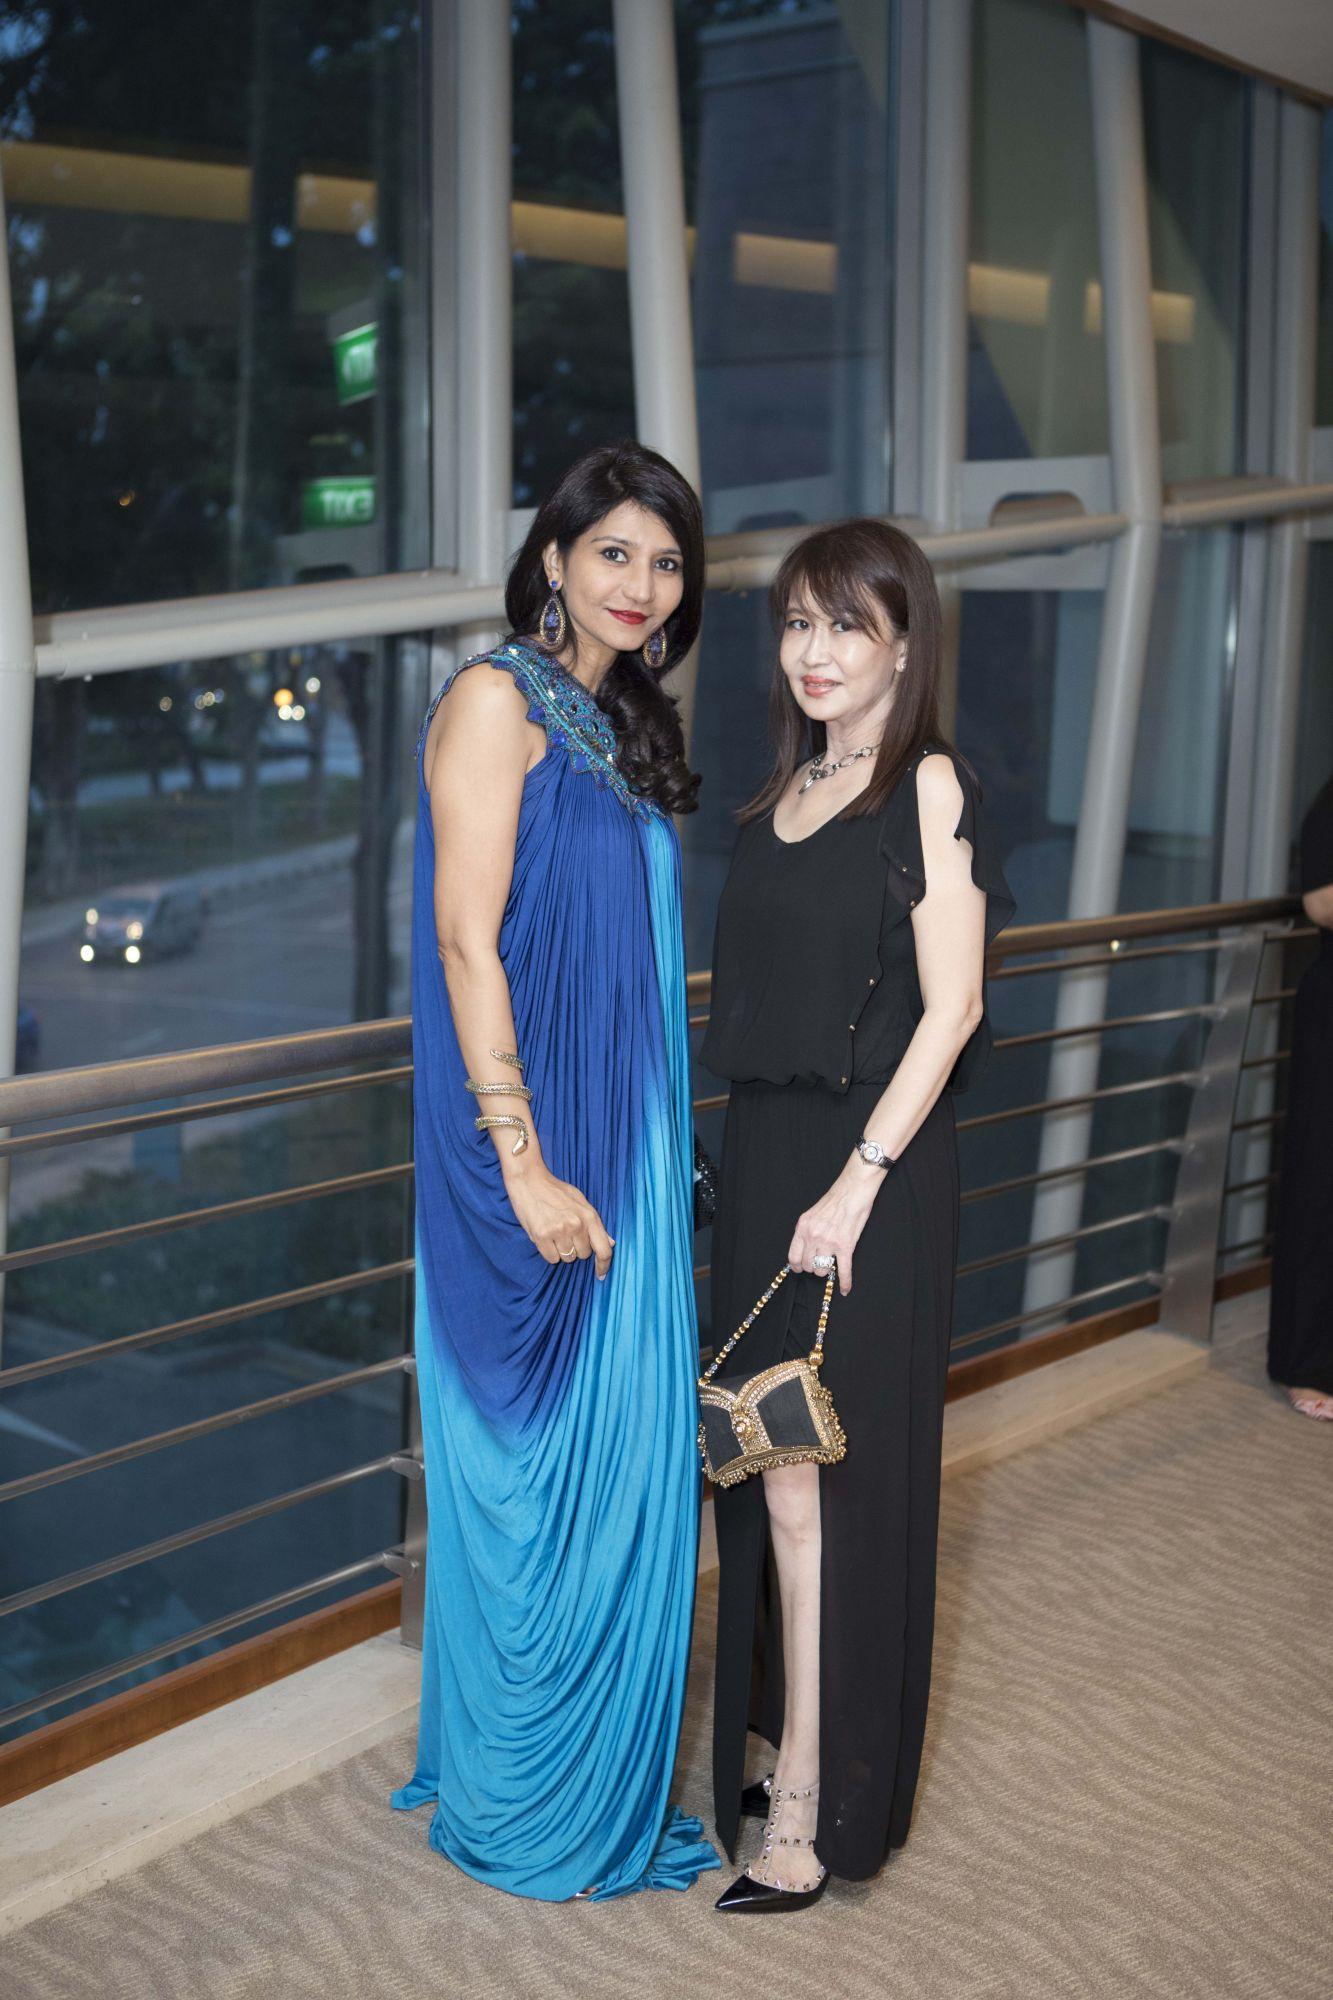 Manju Chandran, Evelyn Sam